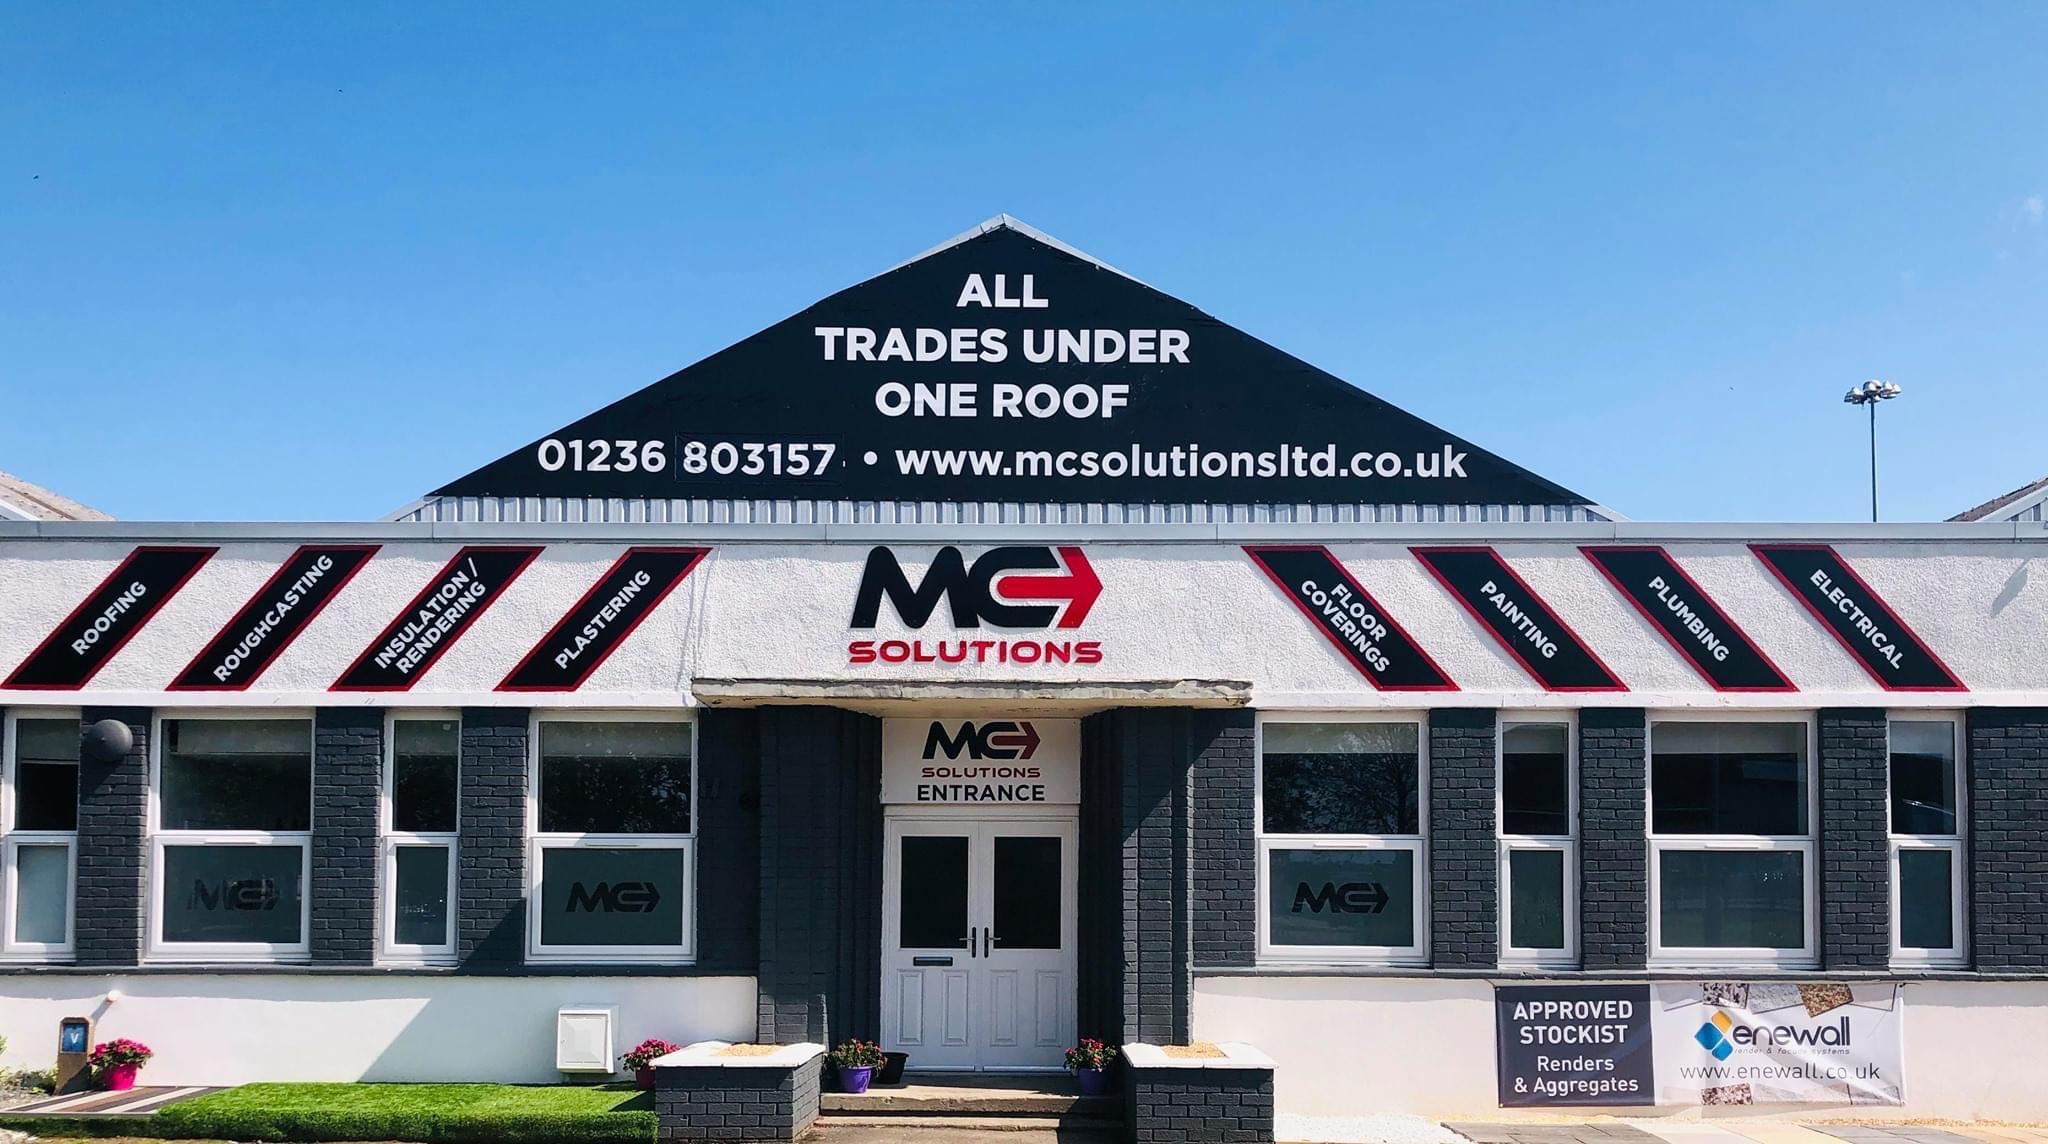 mc-solutions-roughcasters-glasgow-lanarkshire